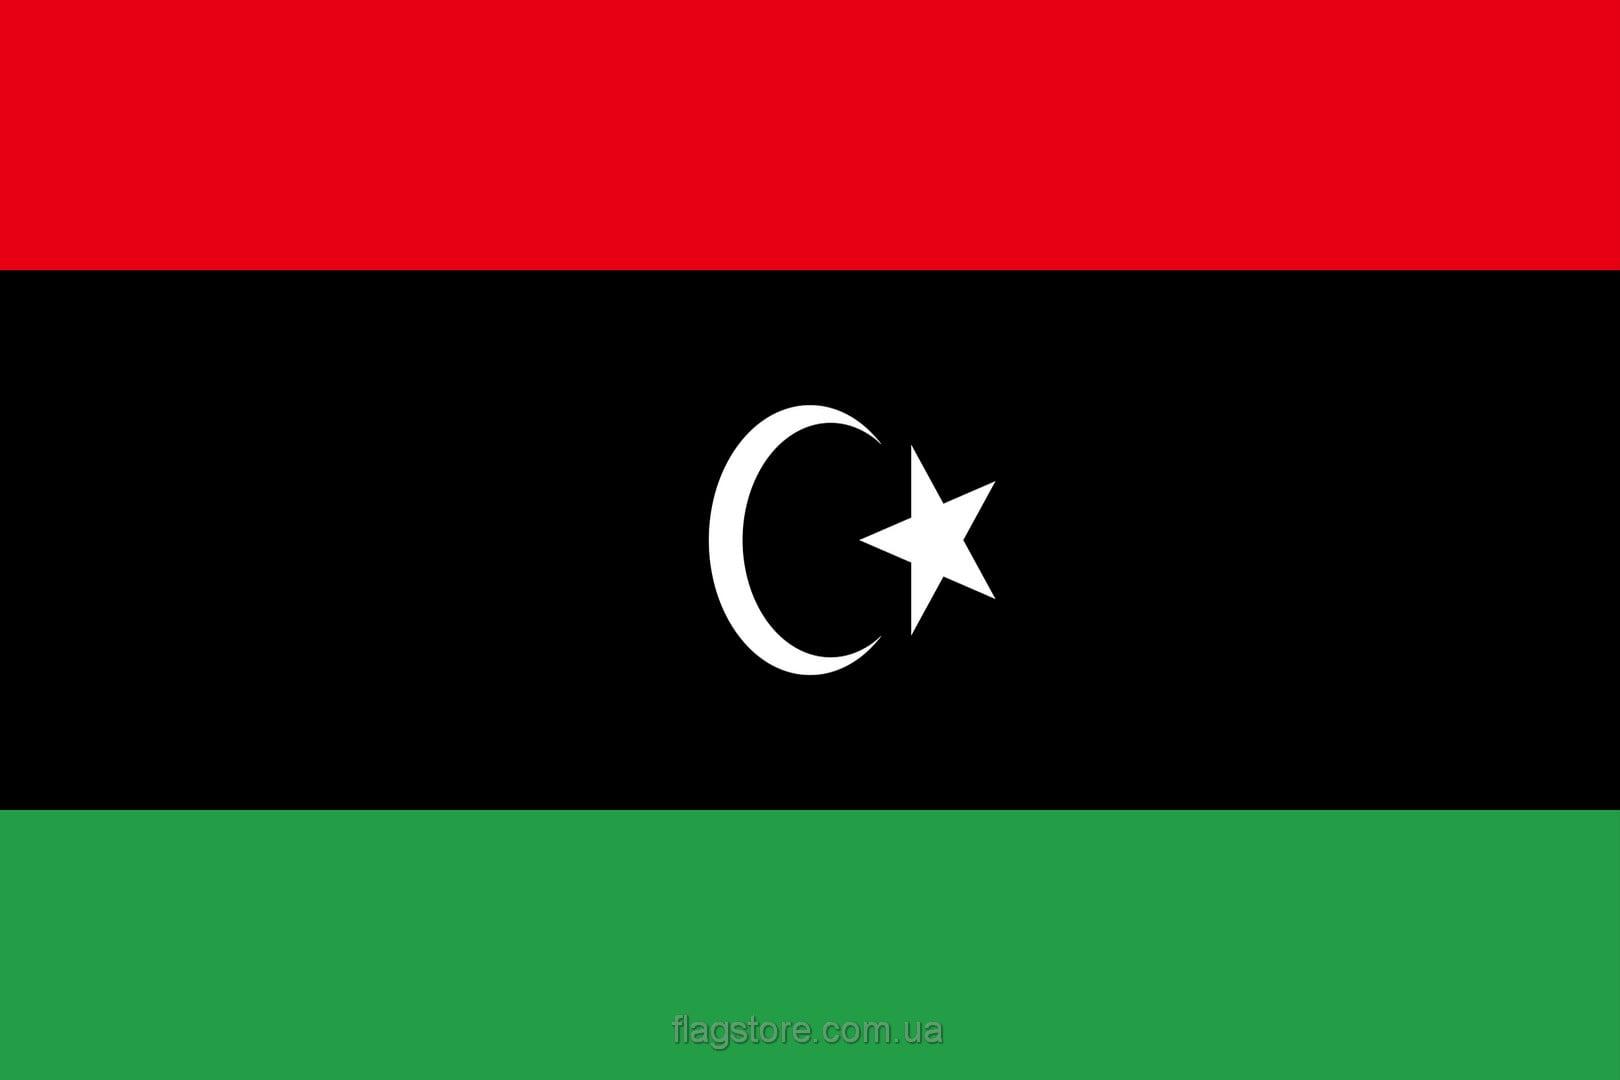 Купить флаг Ливии (страны Ливия)